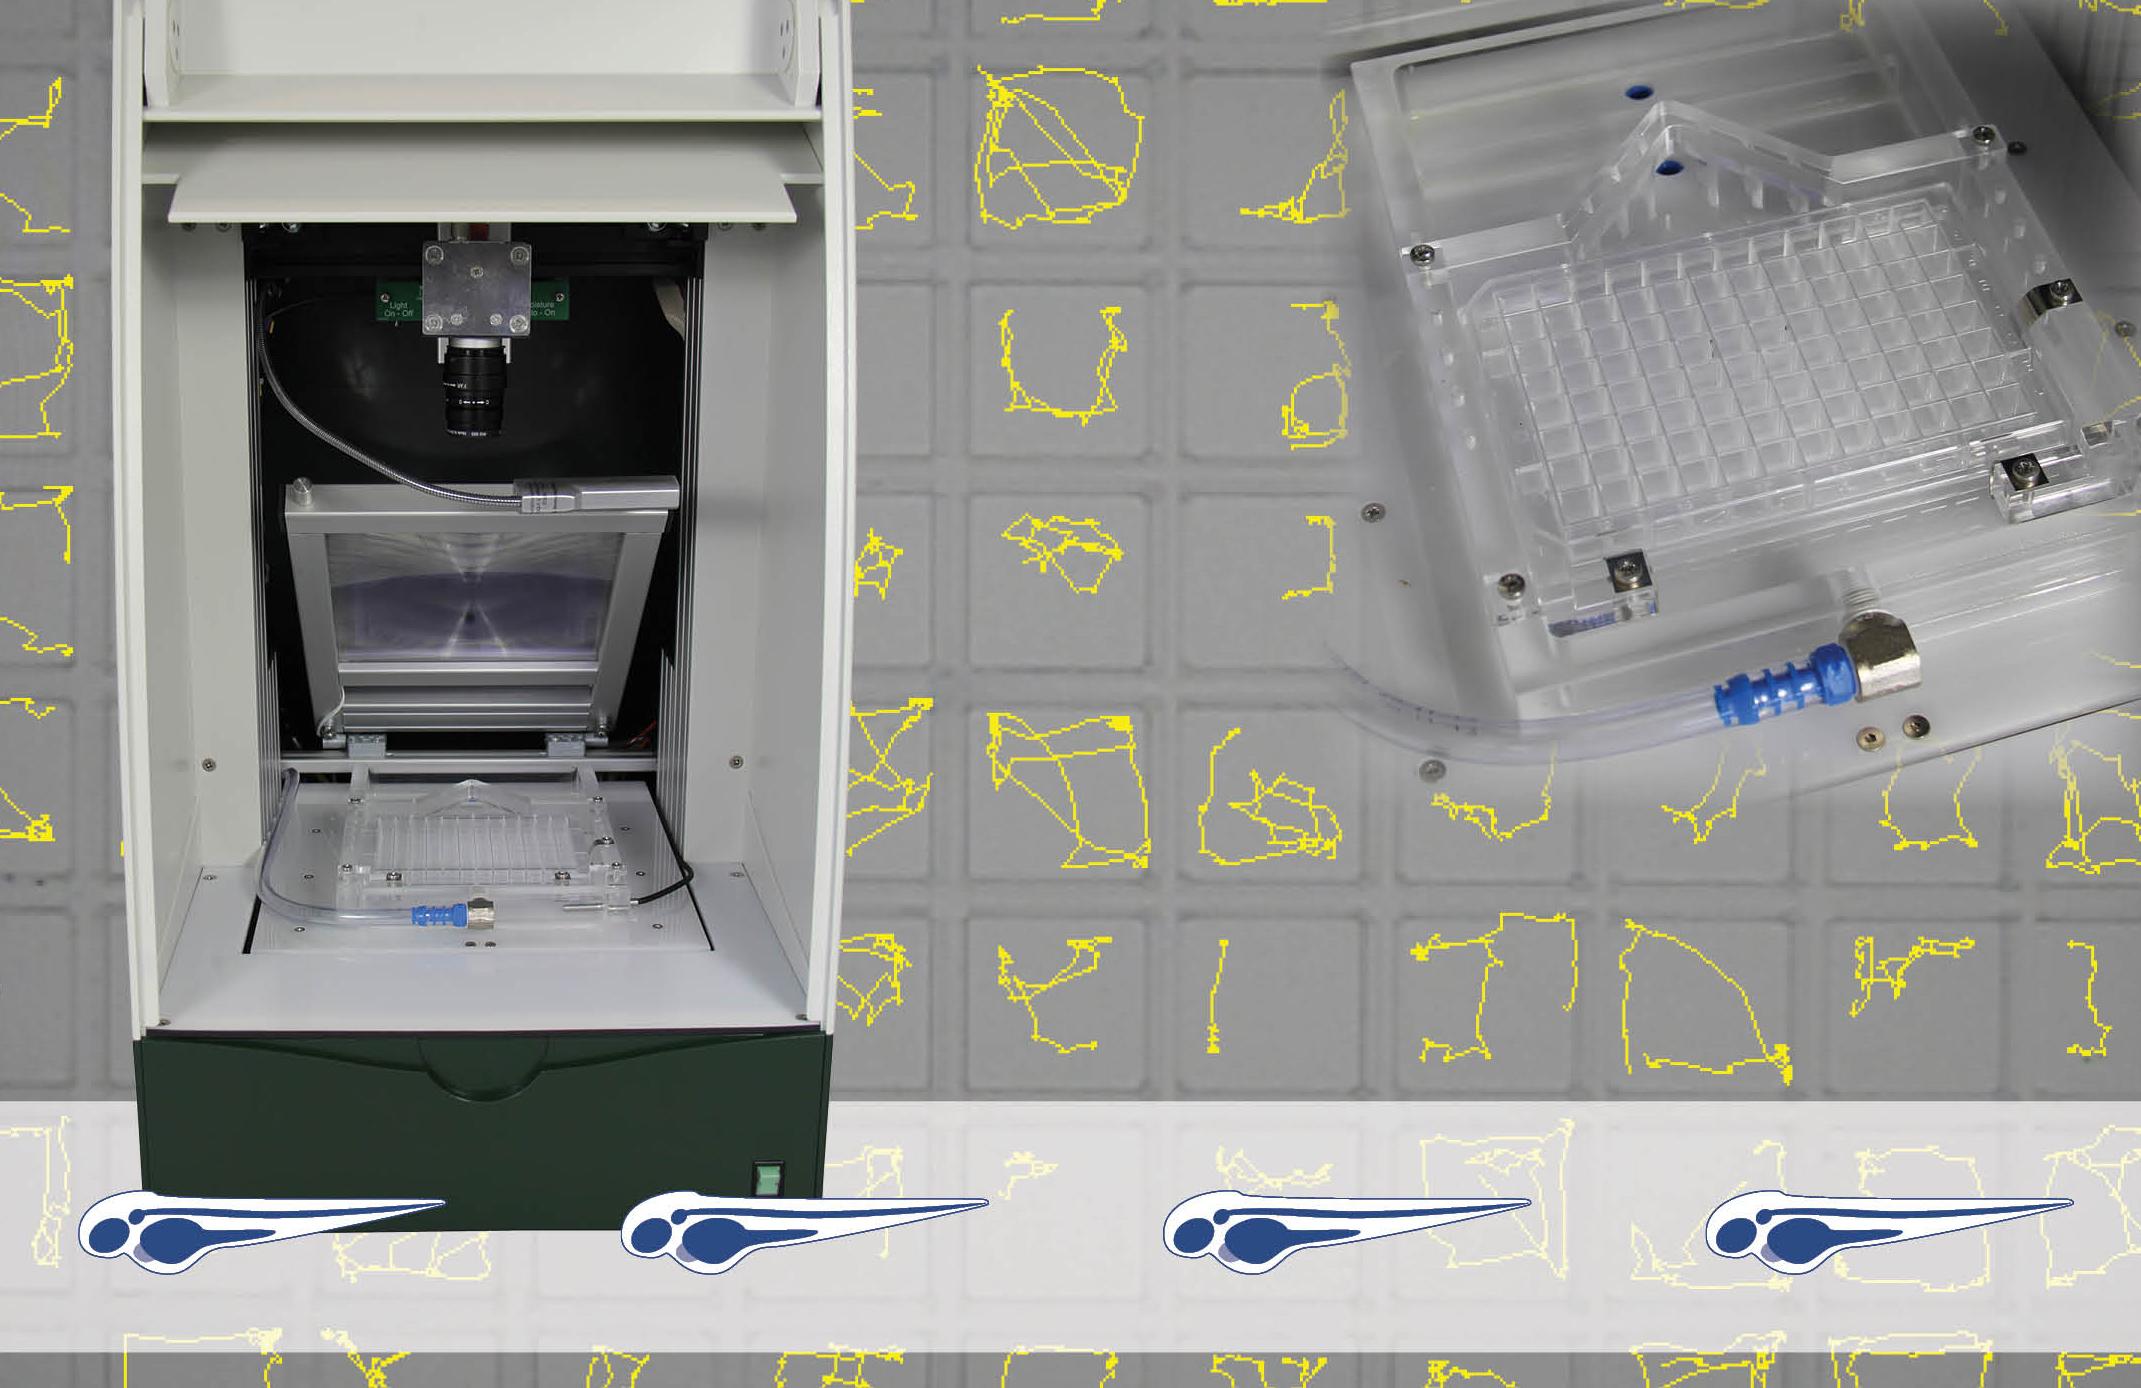 DanioVision斑马鱼行为轨迹跟踪系统